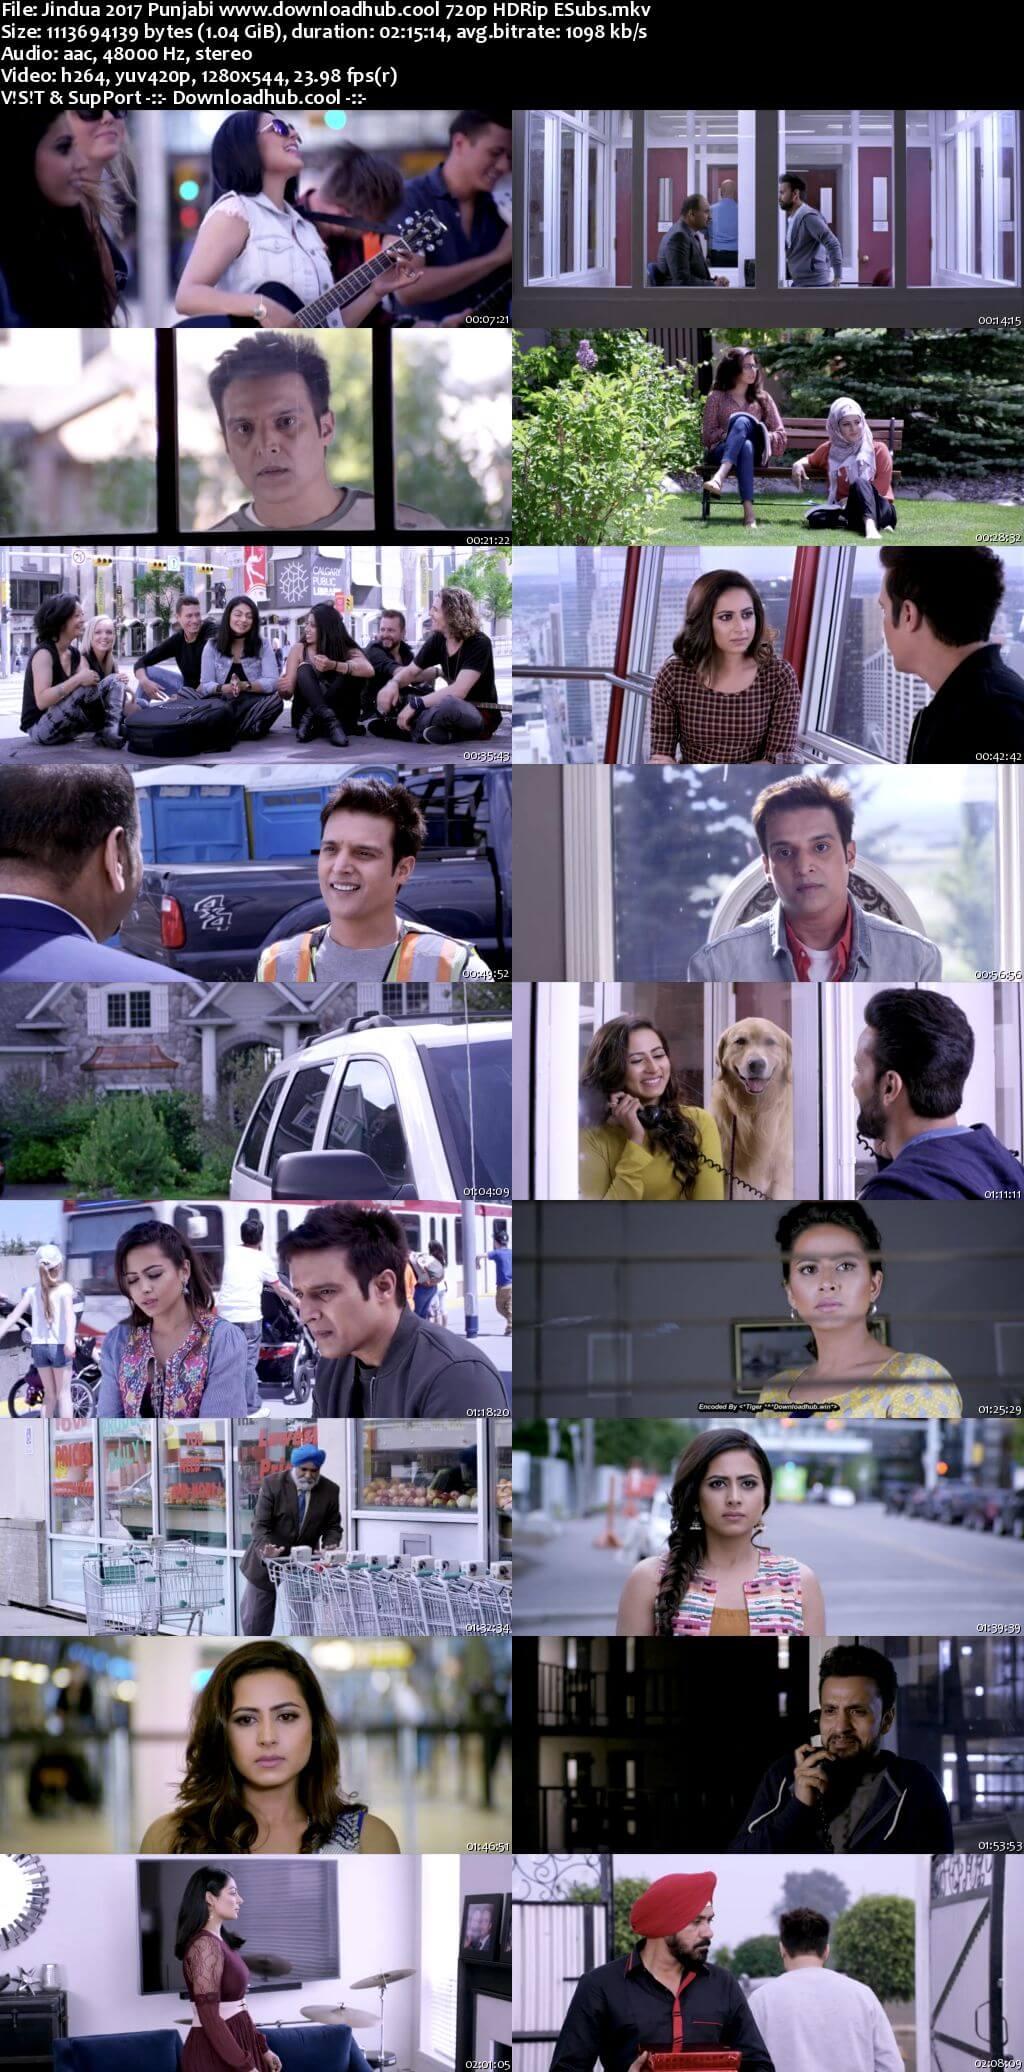 Jindua 2017 Punjabi 720p HDRip ESubs